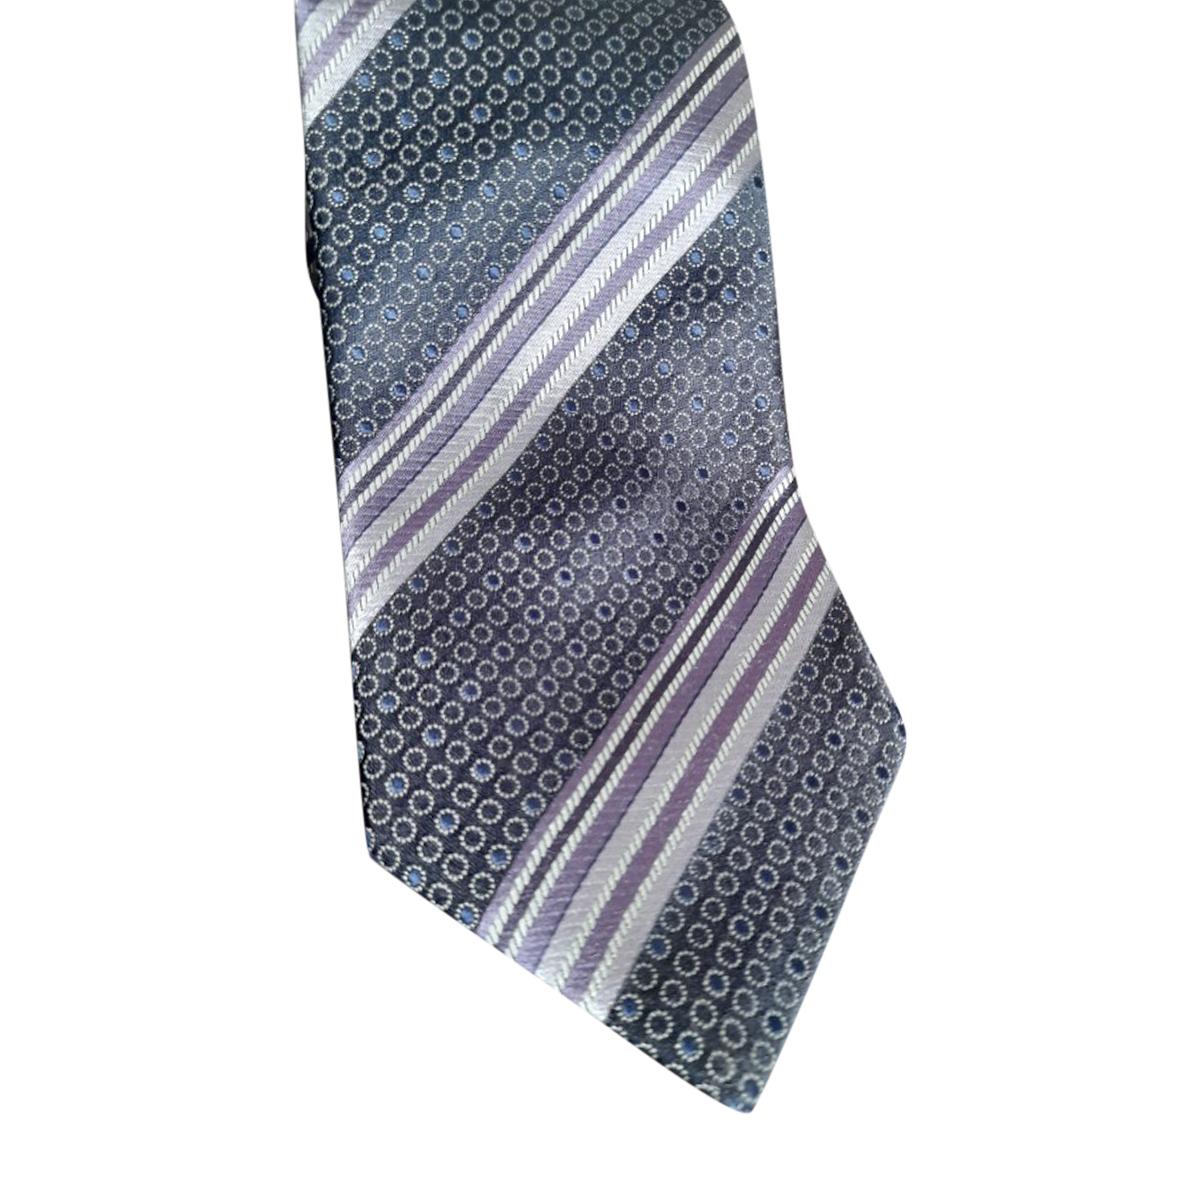 Ermenegildo Zegna Purple Embroidered Silk Classic Tie